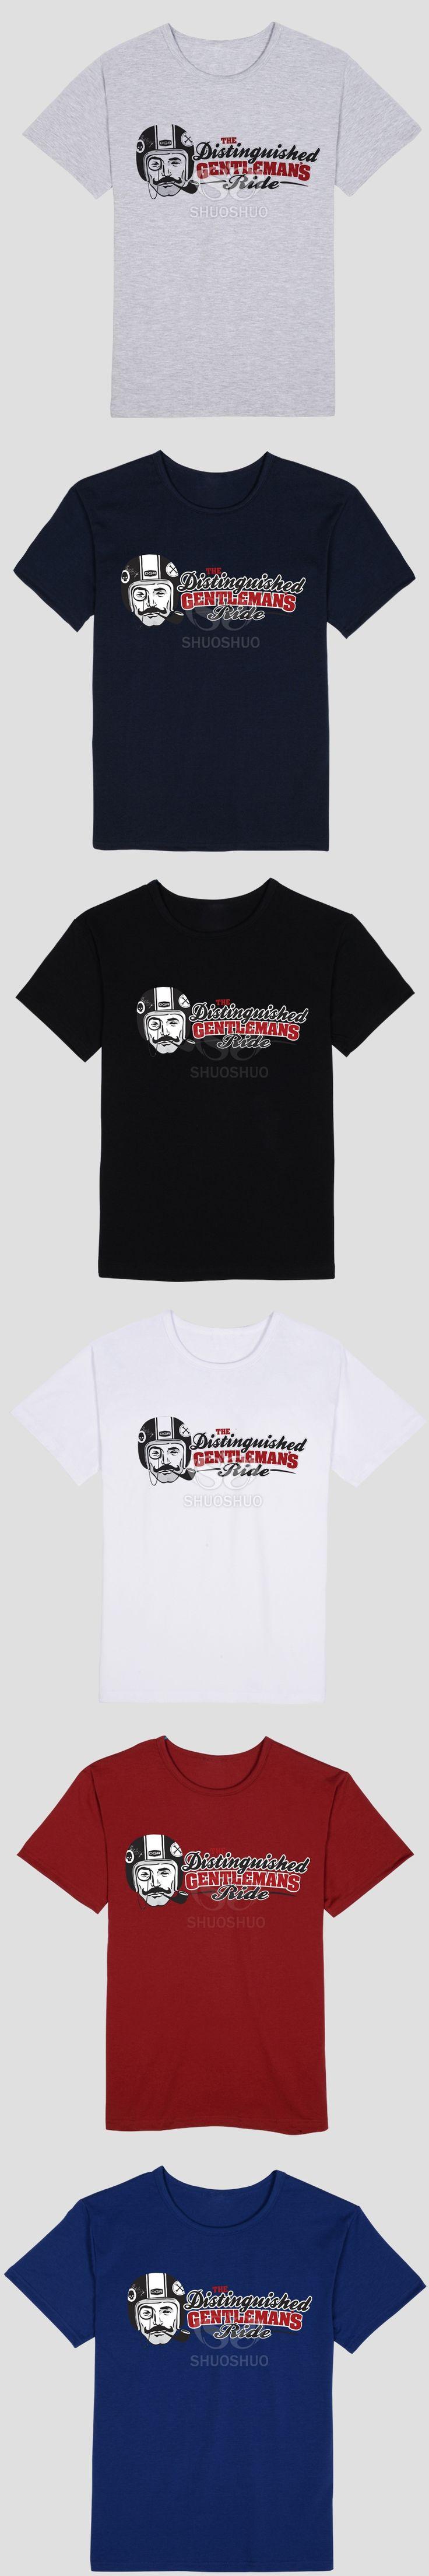 Triumph Distinguished Gentlemen in Action T-shirt Short sleeve O-NeckT shirt TRIUMPH MOTORCYCLE 001